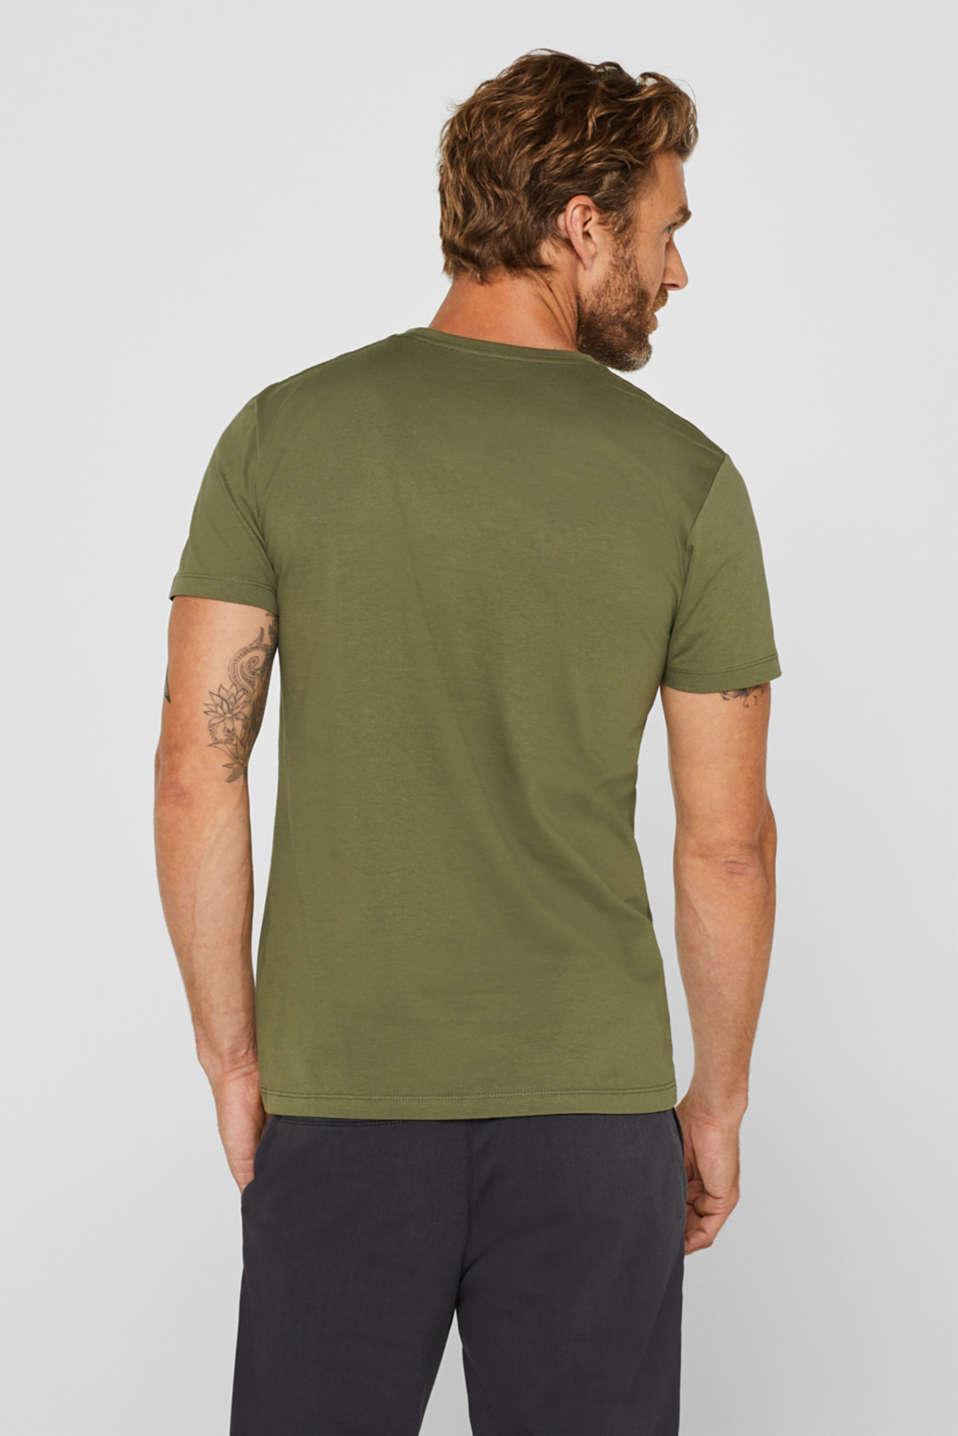 Jersey T-shirt with logo print, 100% cotton, KHAKI GREEN, detail image number 3